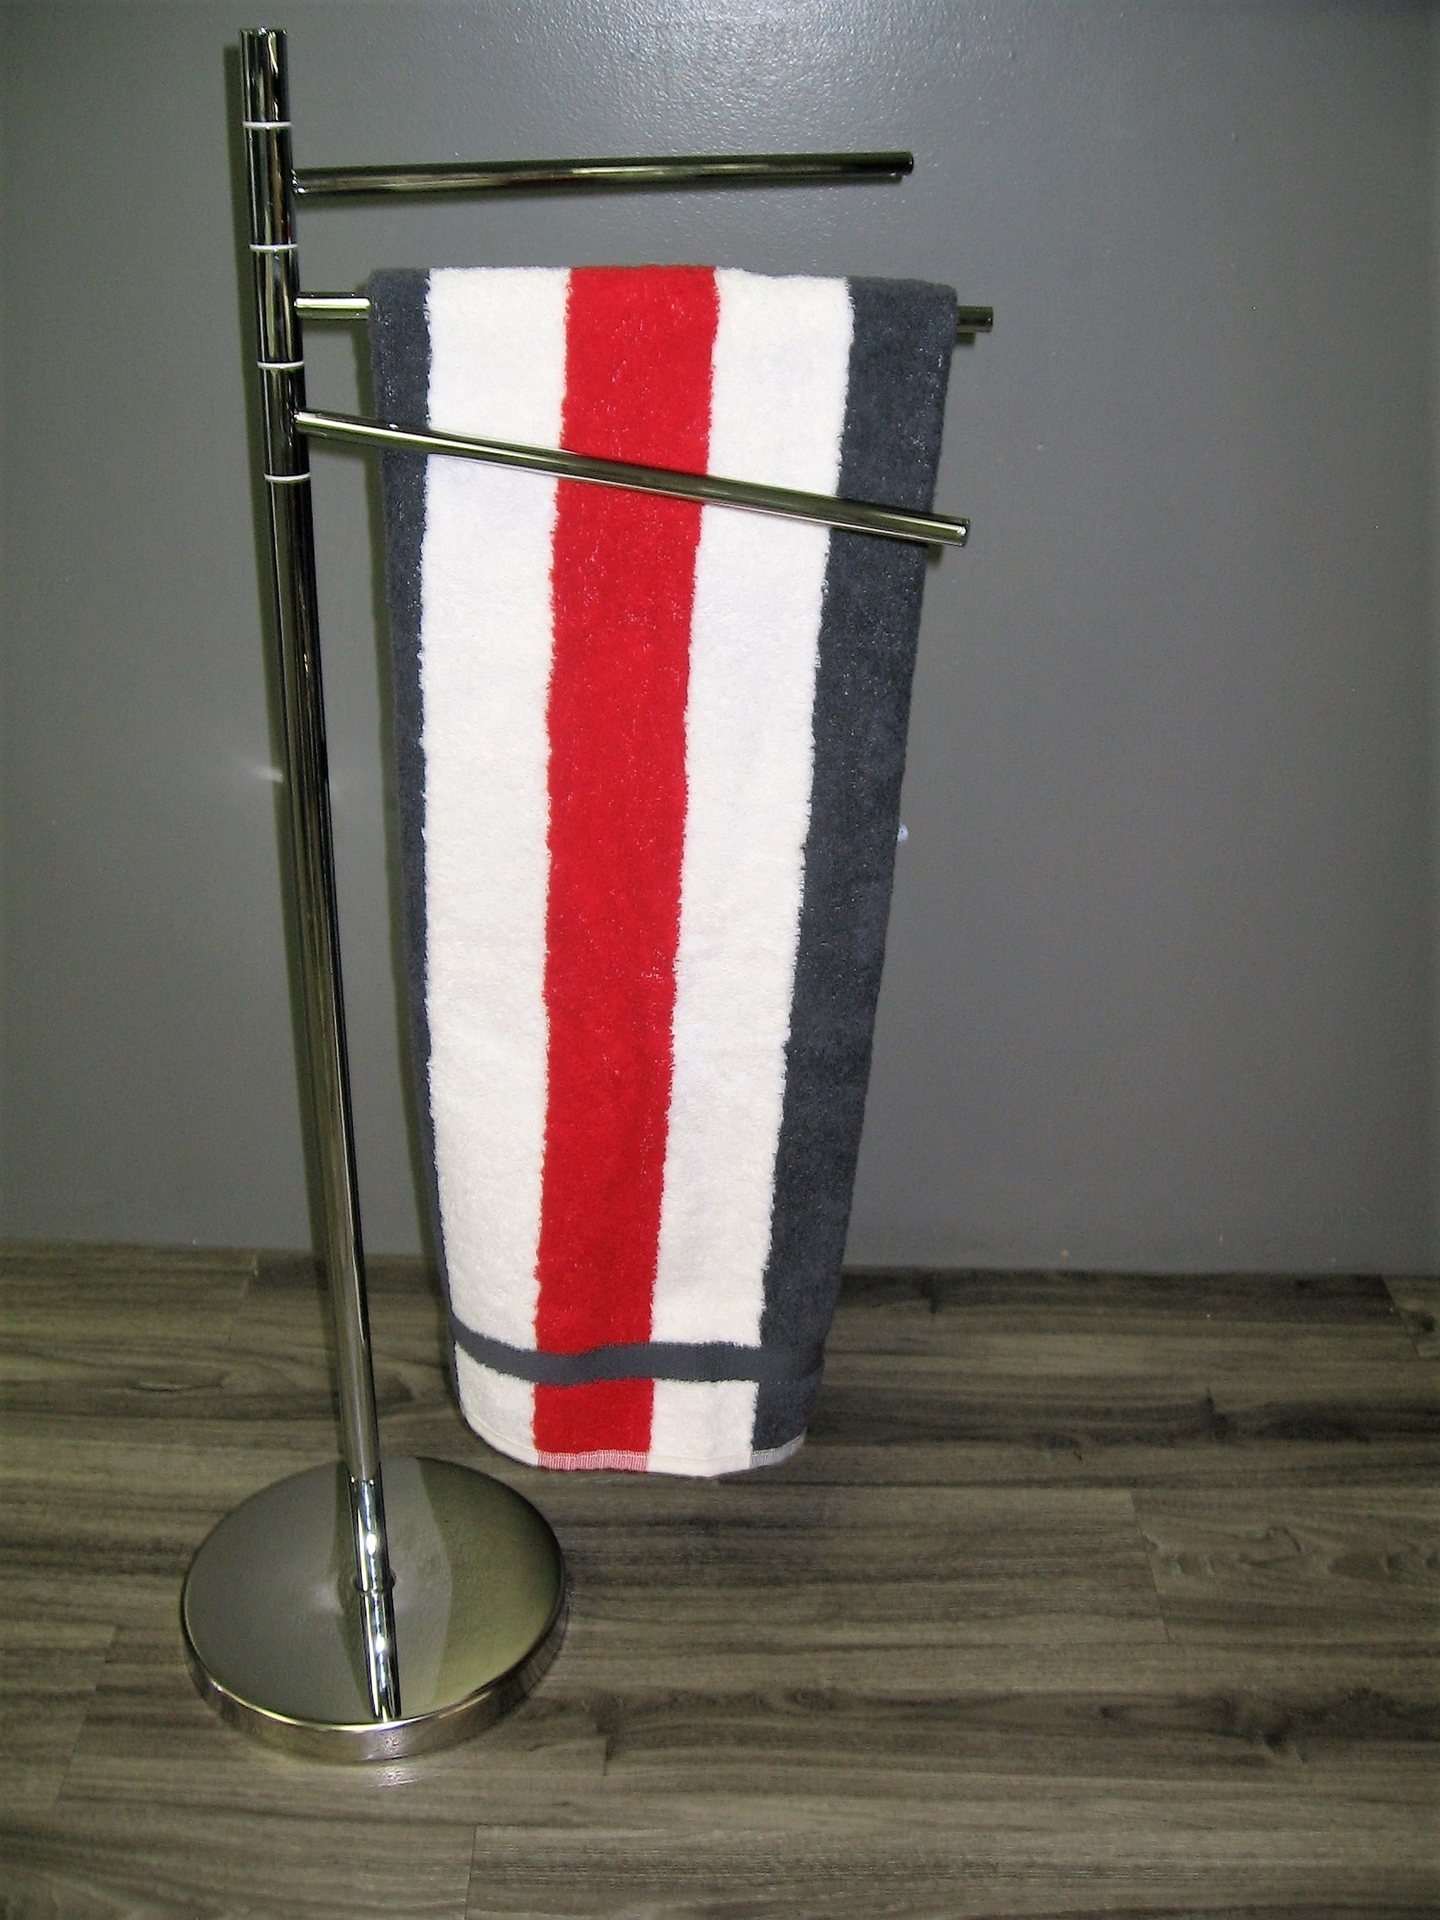 Porte serviette sur pied porte serviette sur pied images for Porte serviette sur pied design